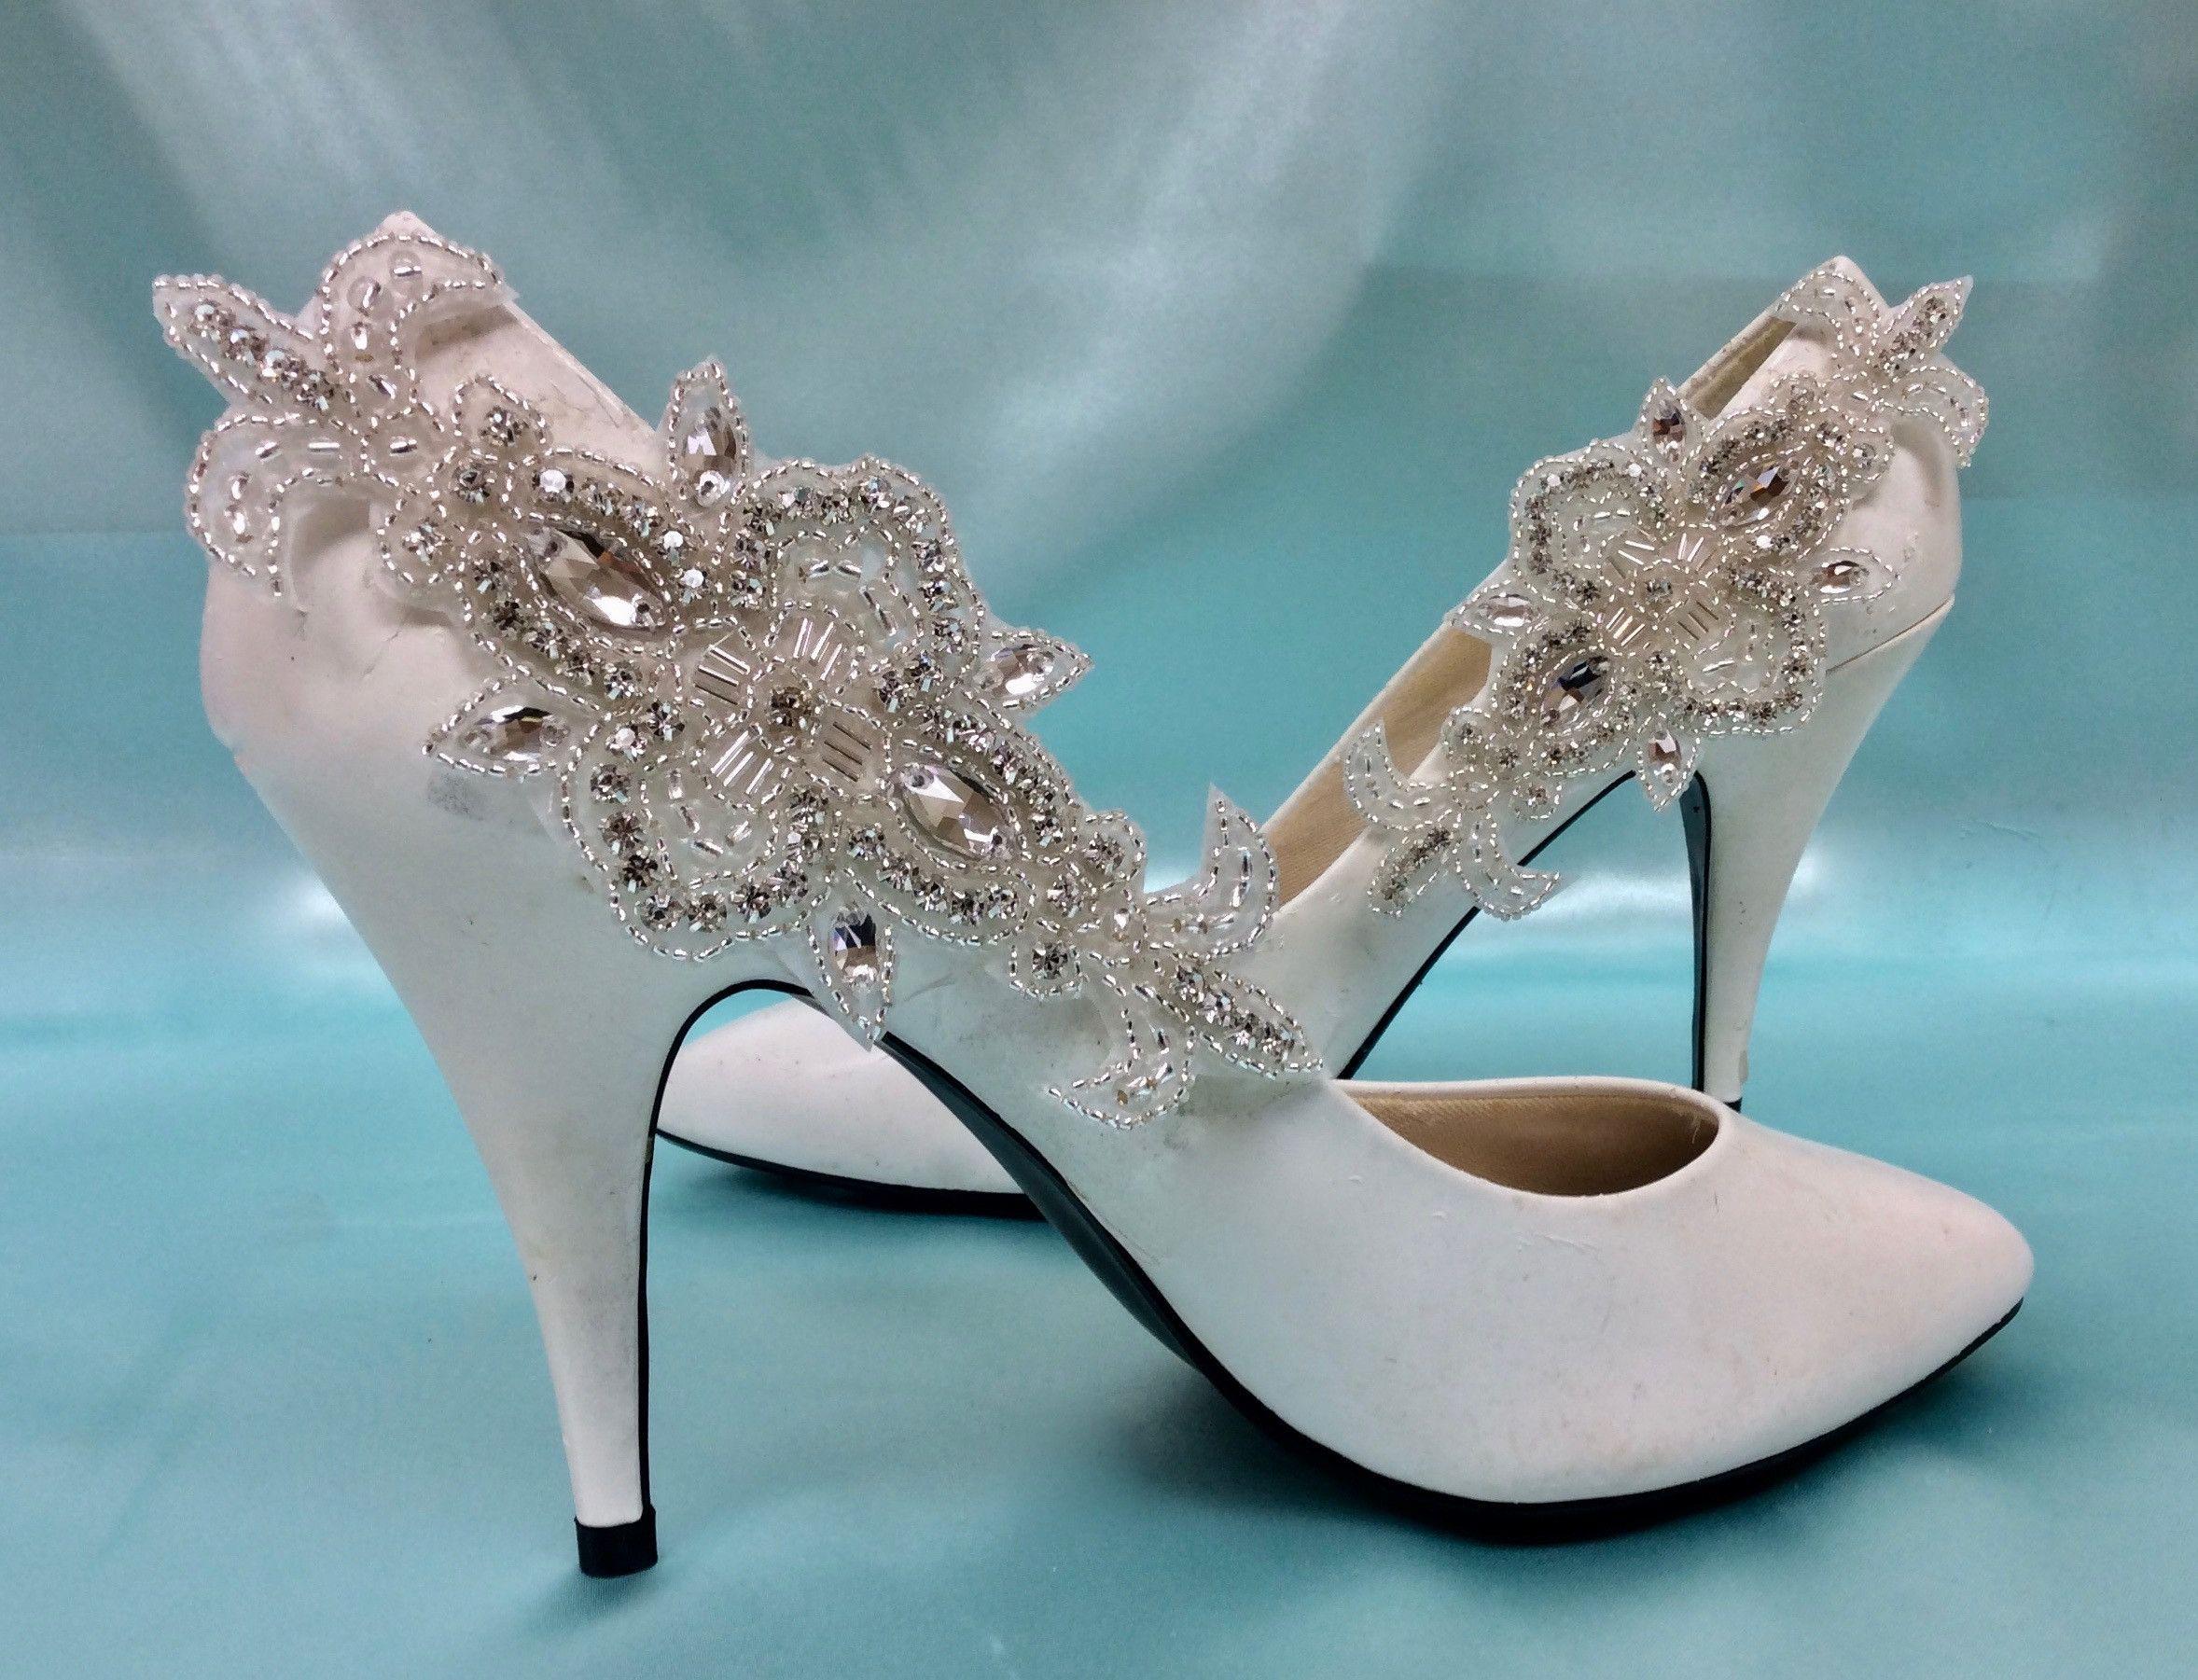 Bridal Wedding Shoe Clips, Rhinestone Crystal Shoe Accessory ...